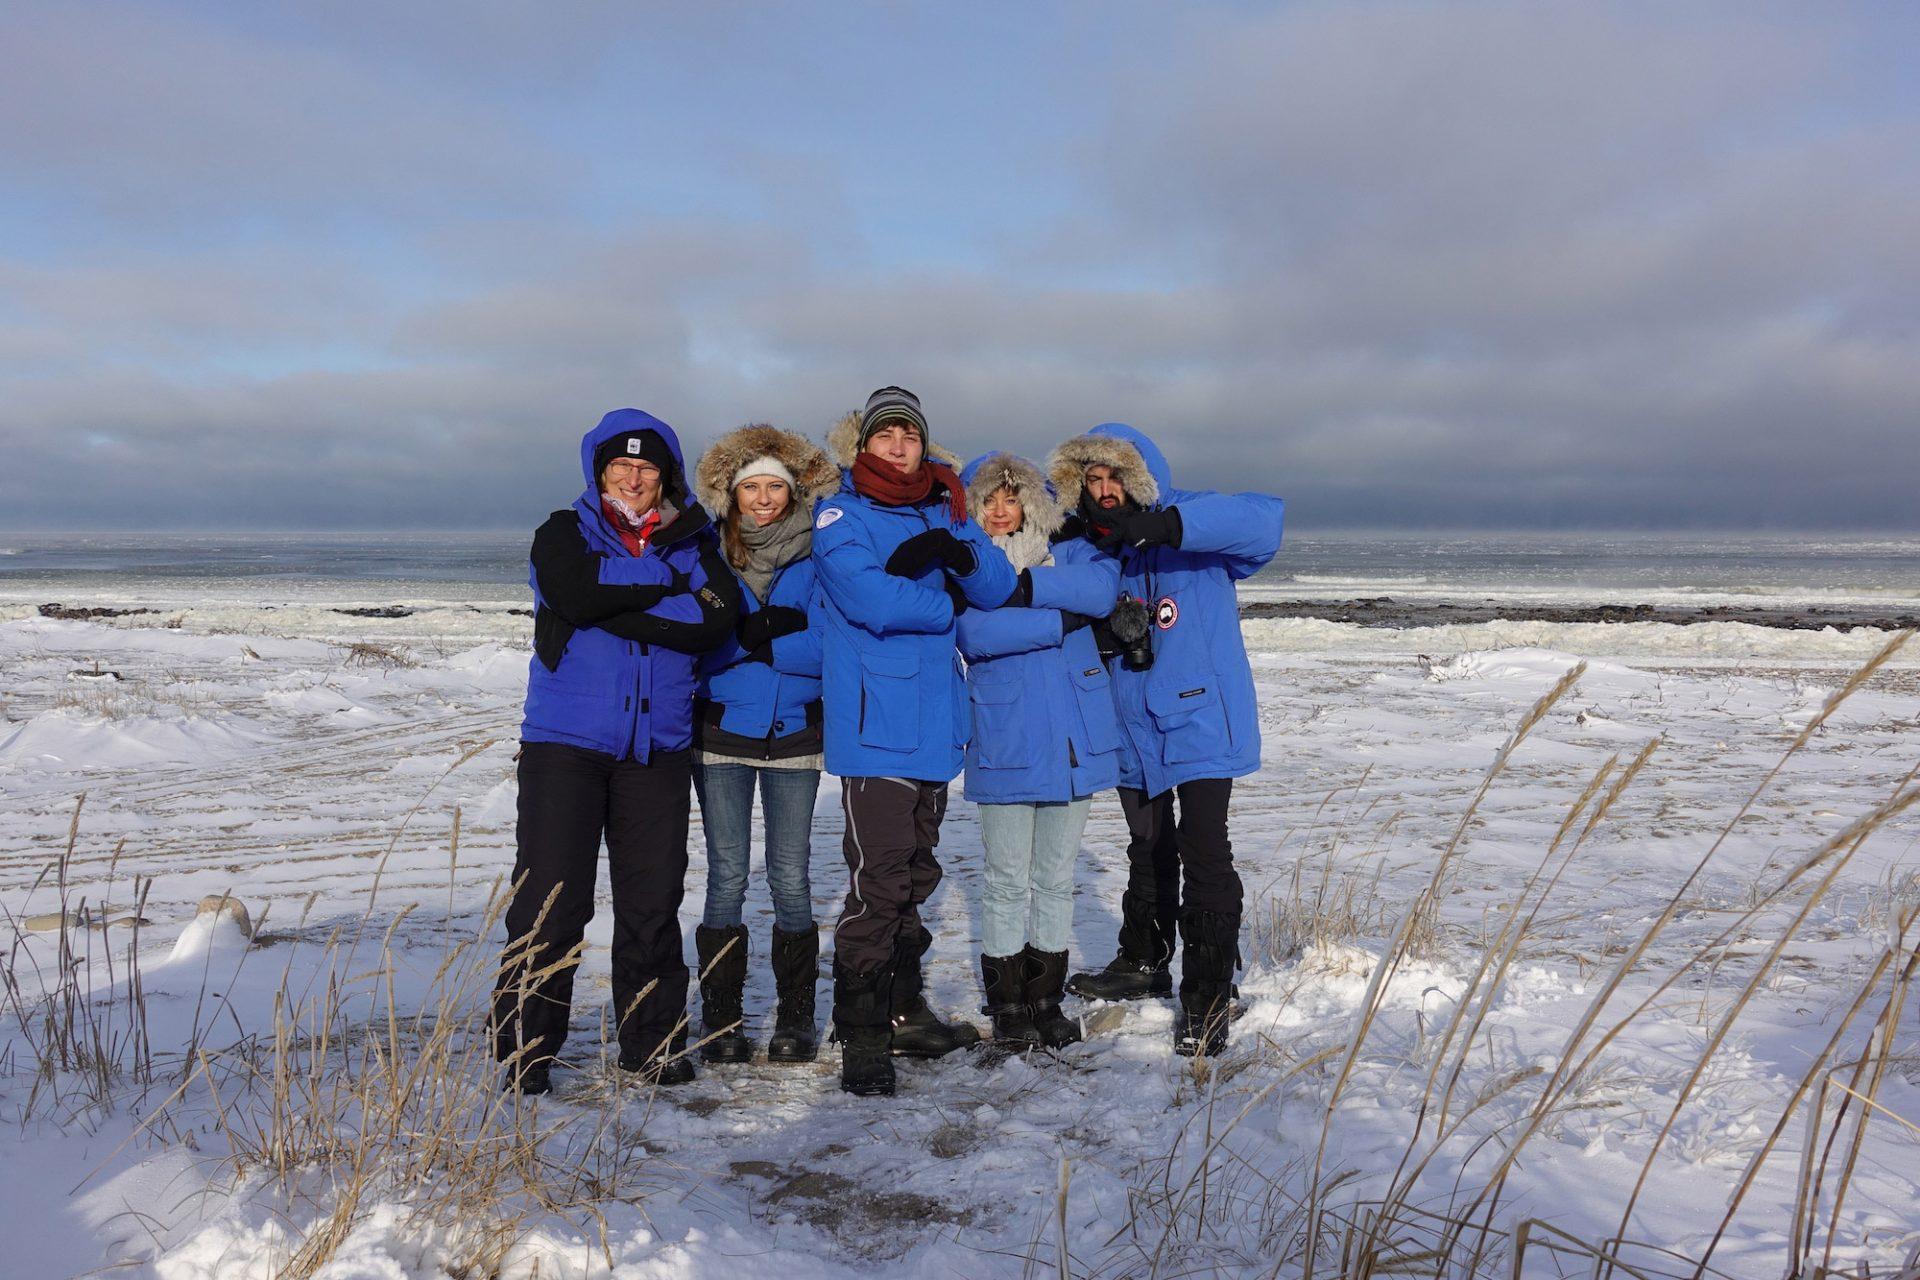 Sybille Klenzendorf, Melanie Gömmel, Anton Reyst, Anne Thoma, Joseph Bolz in der Hudson Bay